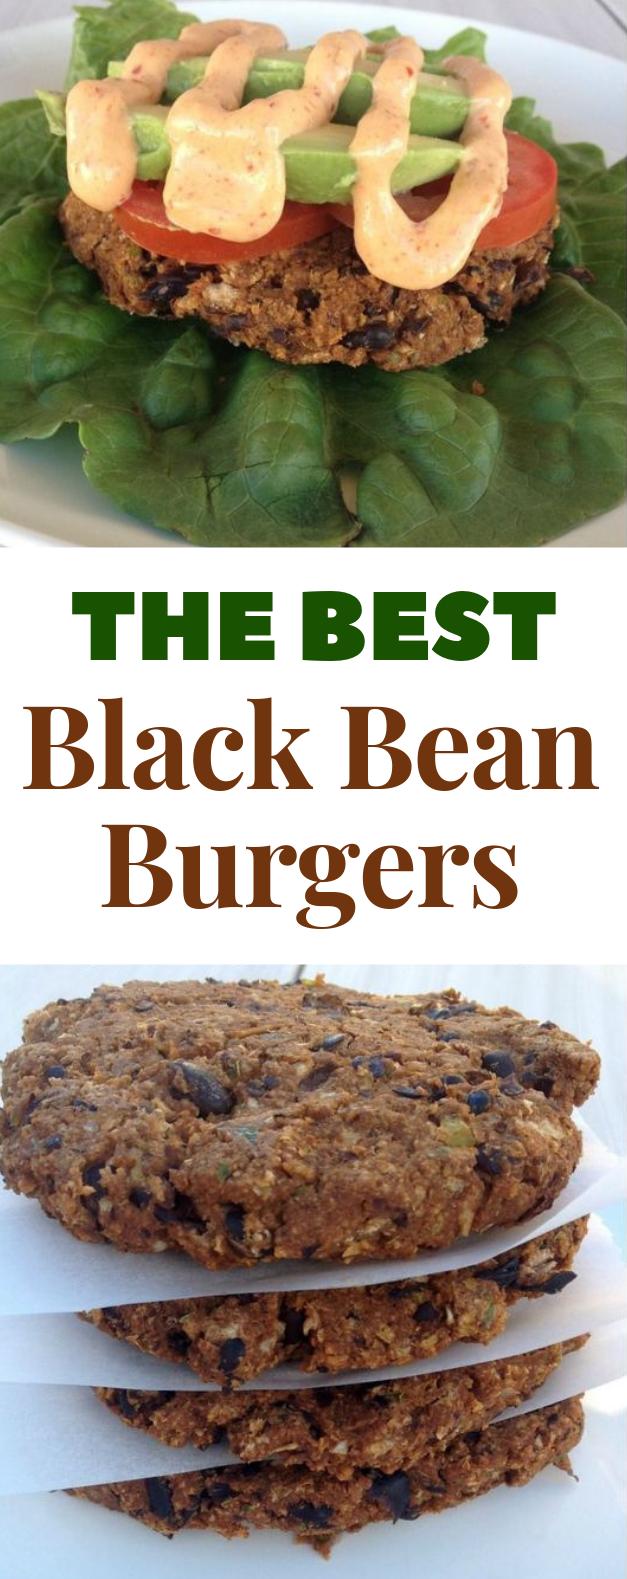 BLACK BEAN BURGERS #Burgers #HealthyRecipe